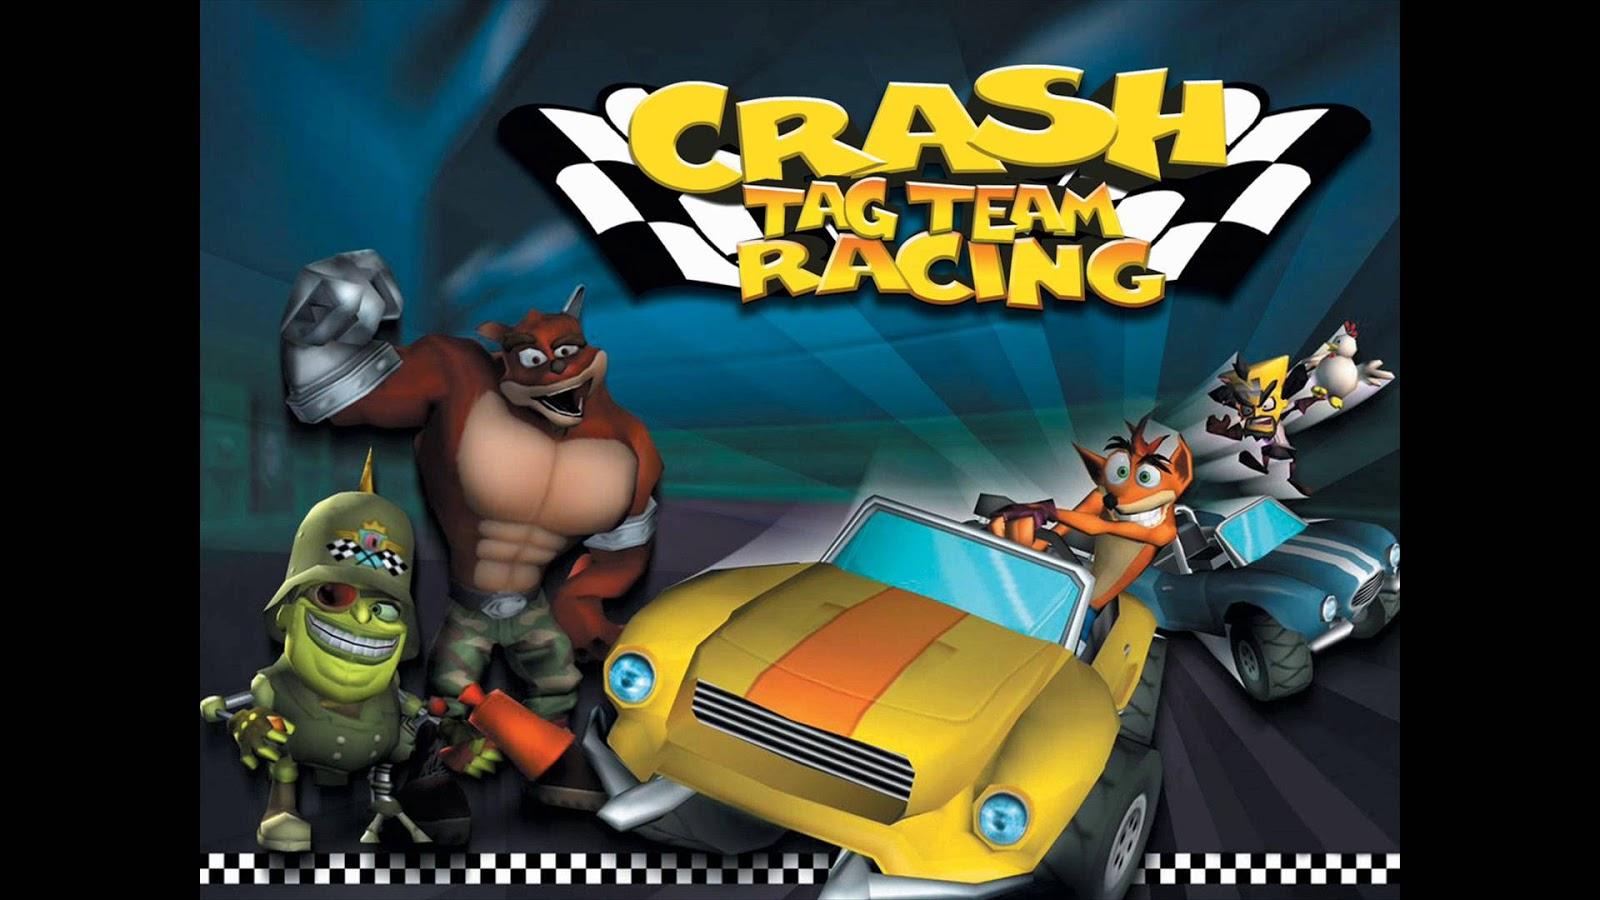 Download crash tag team racing psp iso